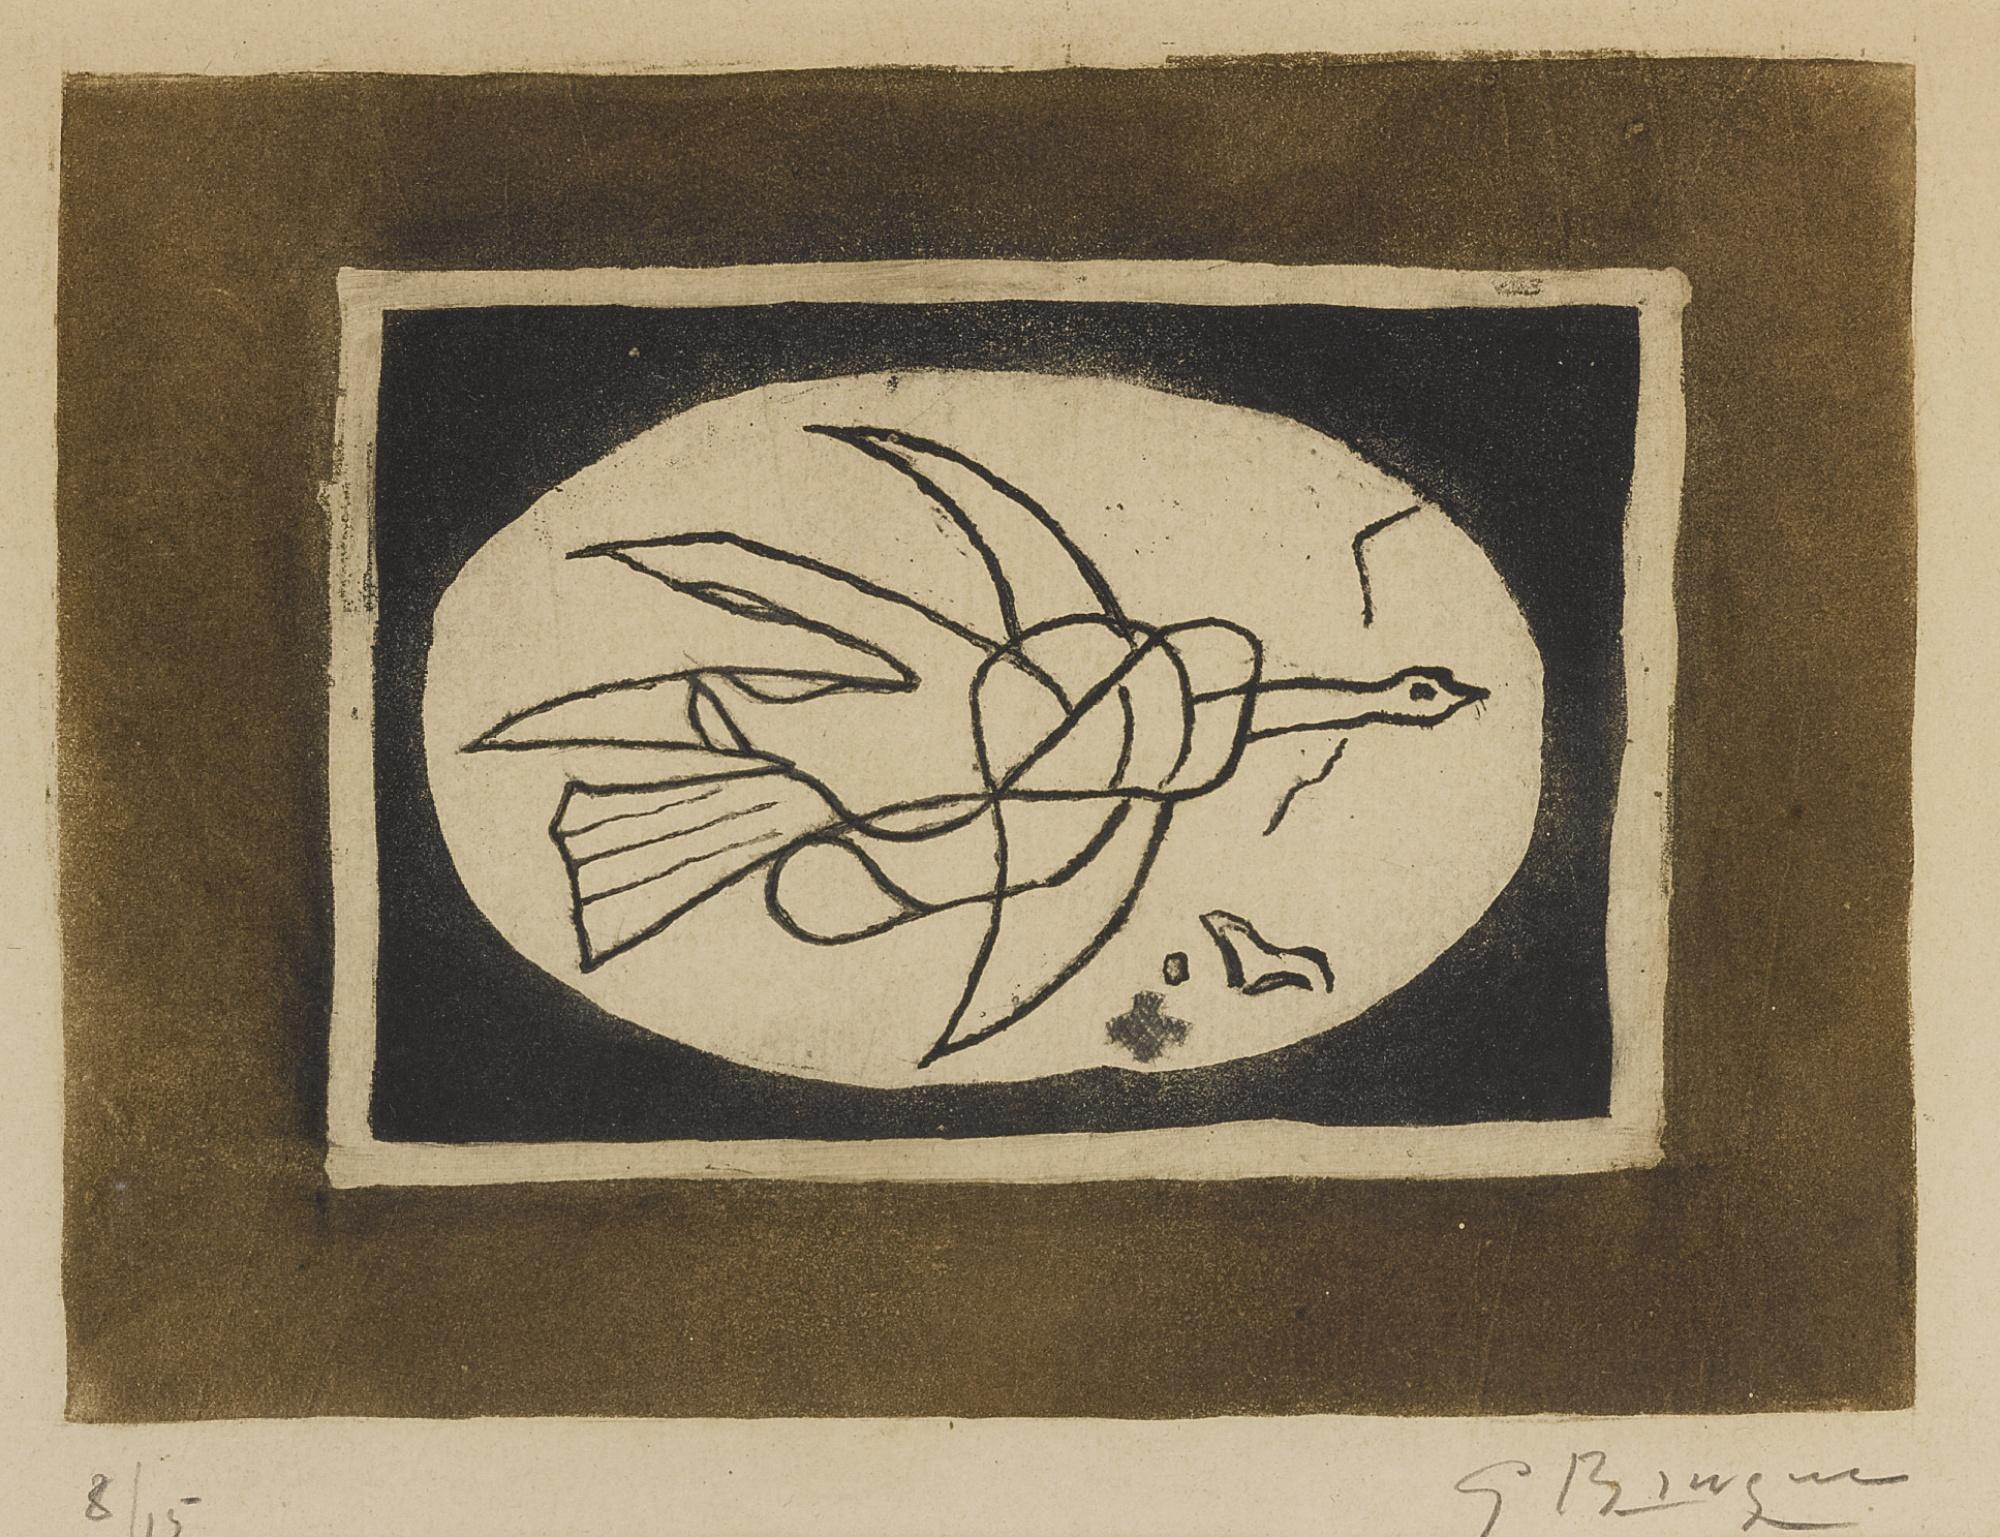 Georges Braque-Oiseau Marron I (Oiseau V) (V. 78)-1952